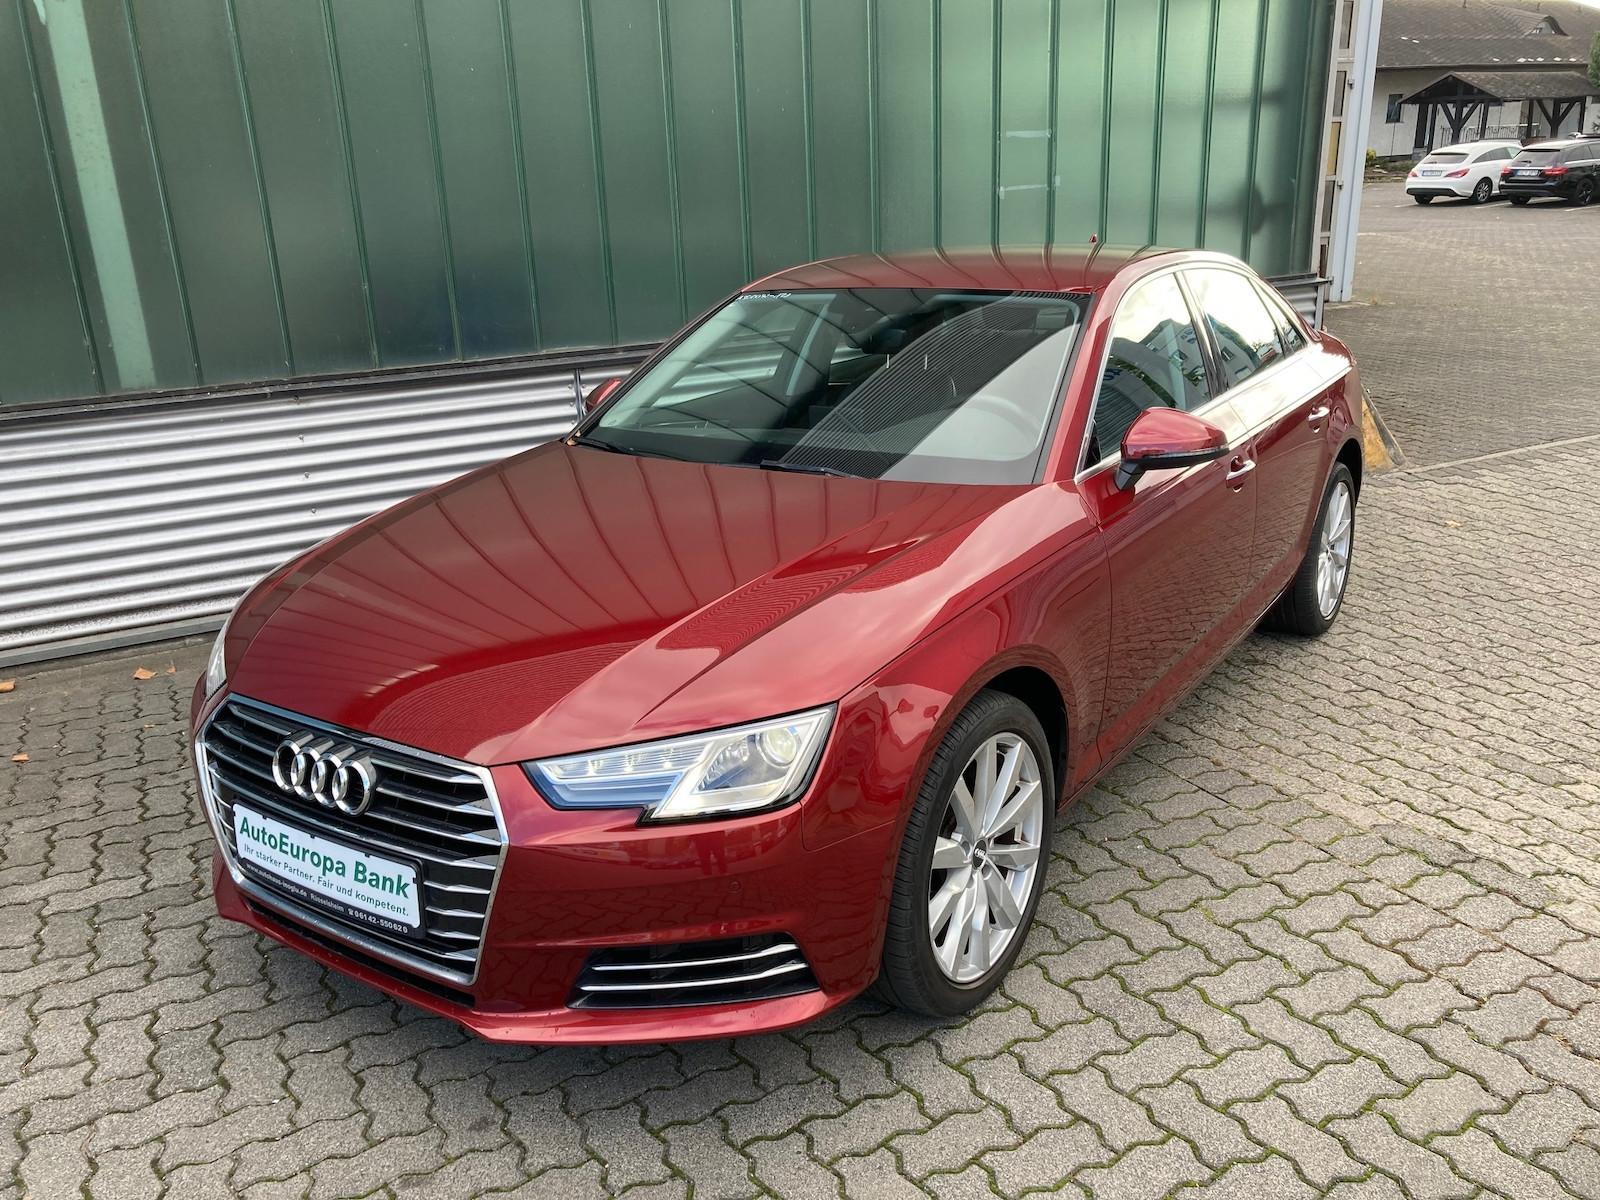 Audi_A4__15